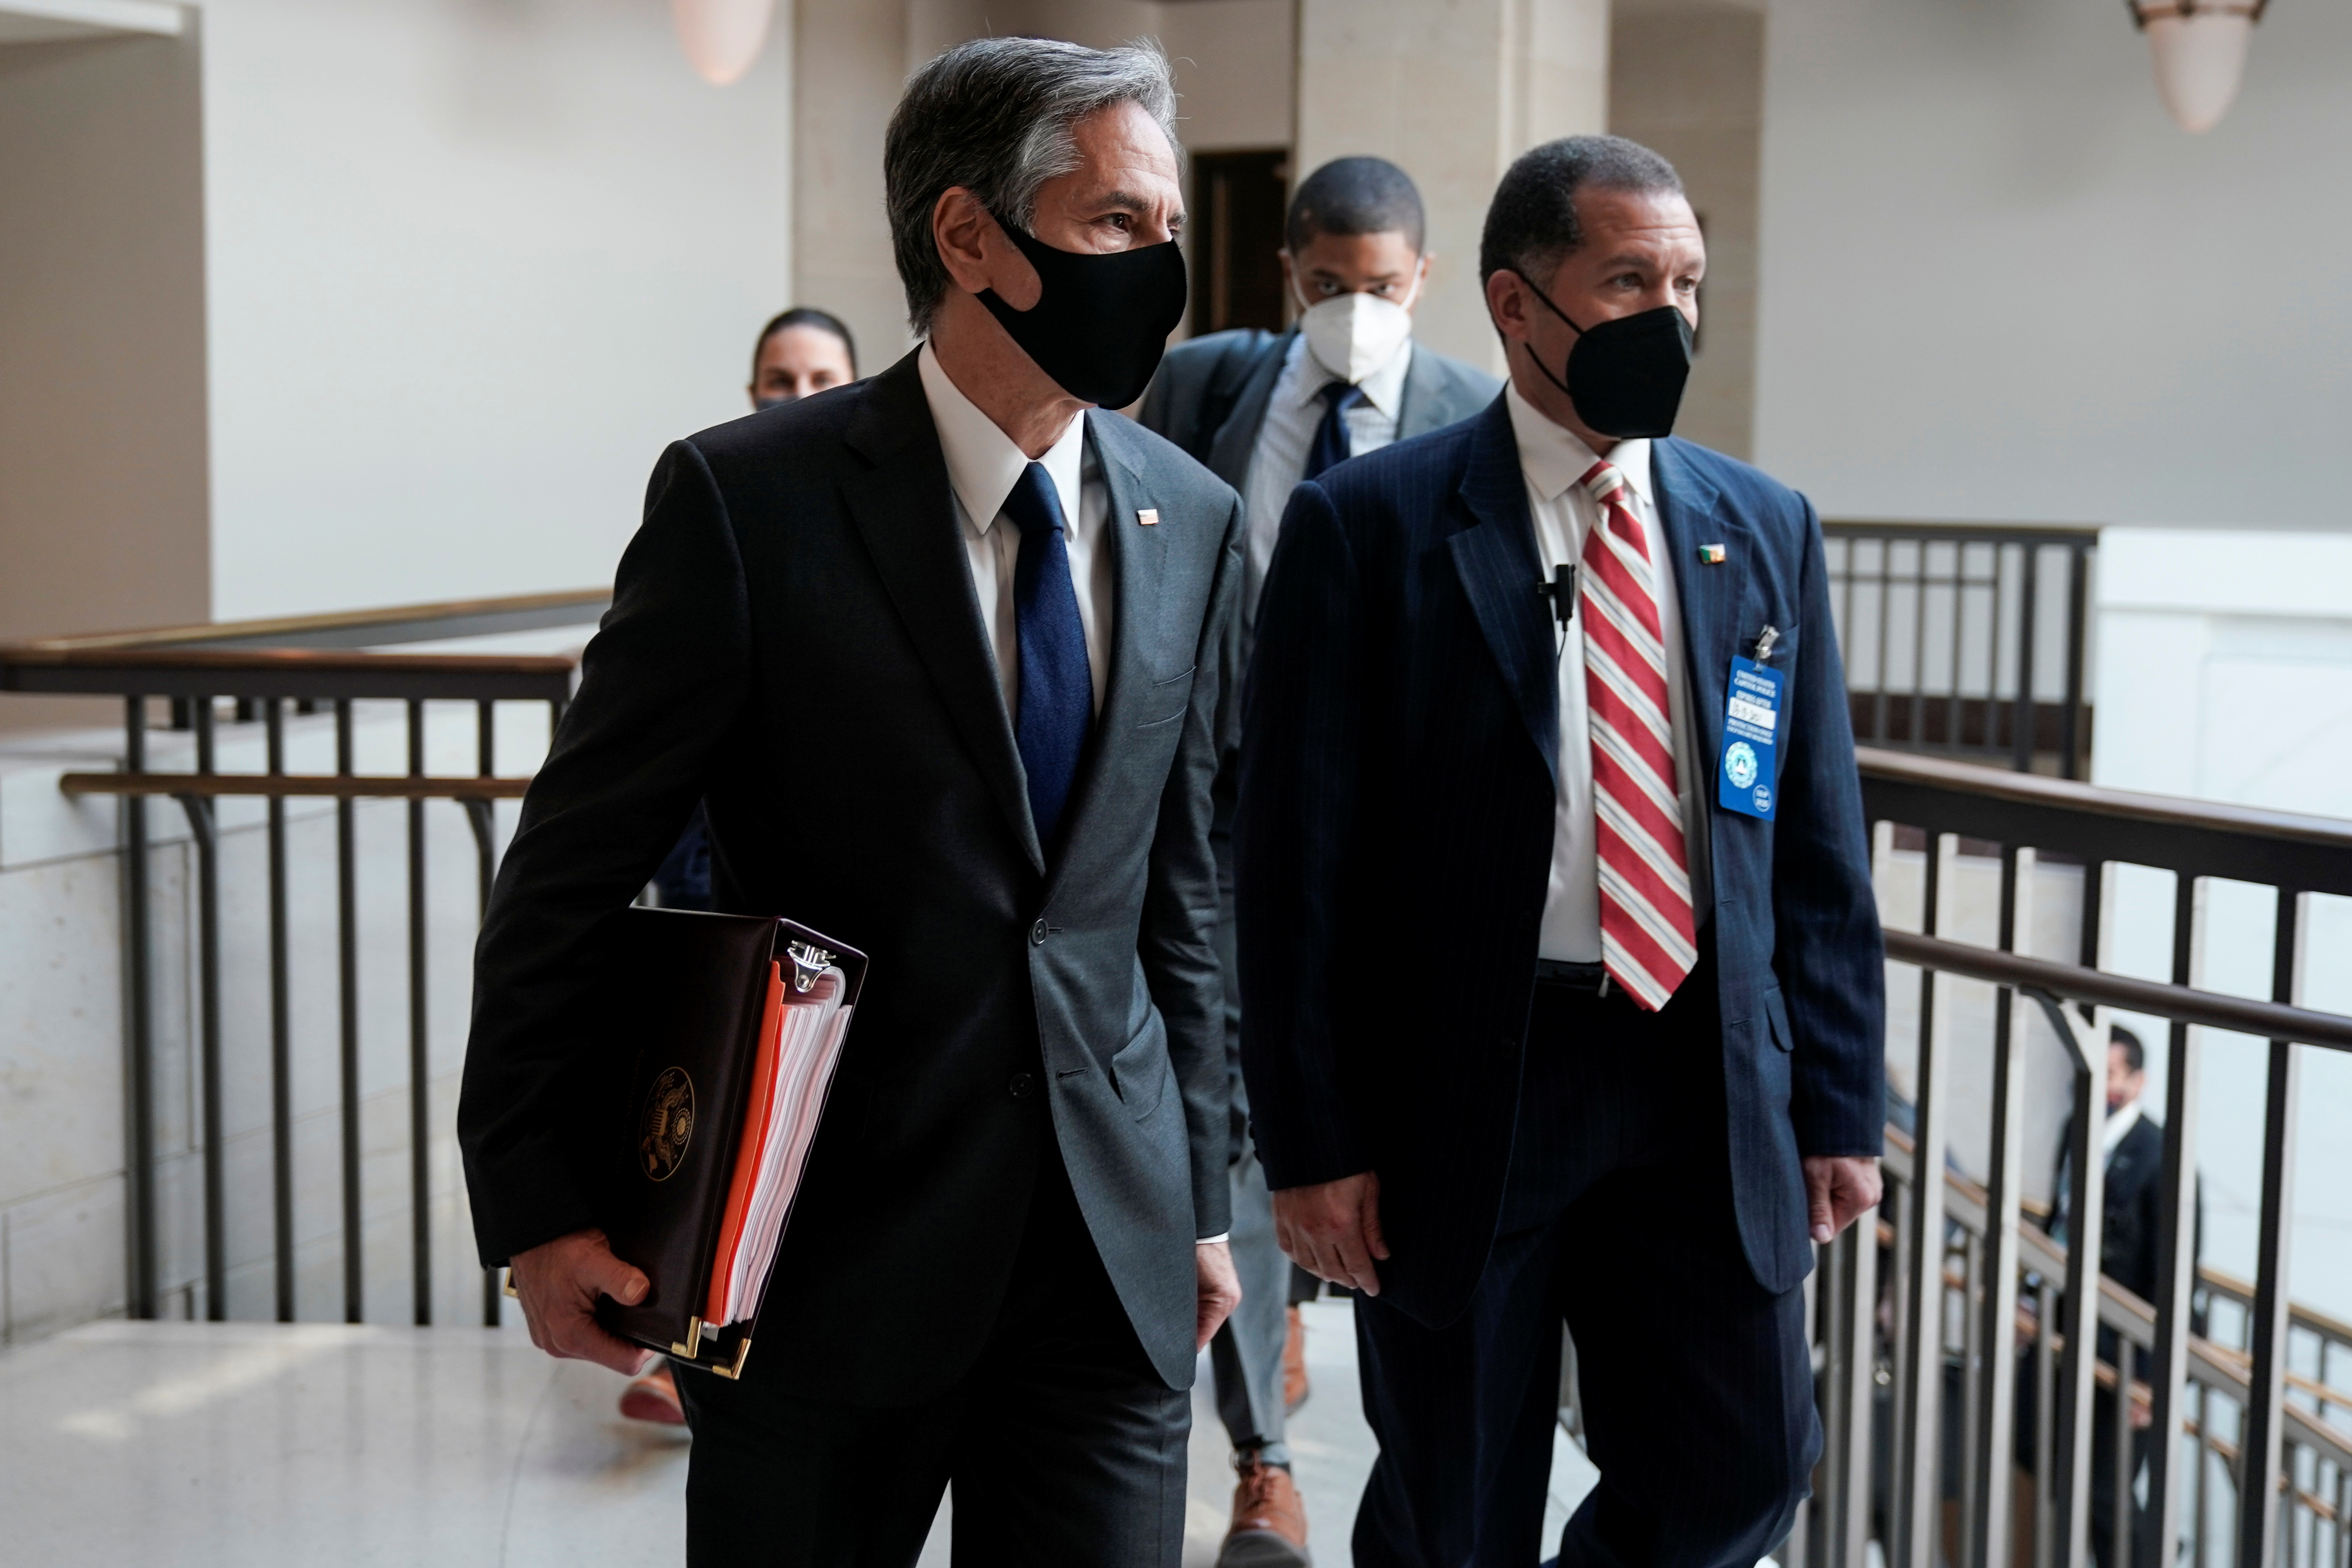 U.S. Secretary of State Antony Blinken departs after briefing Senators on Capitol in Washington, U.S., on March 11, 2021. REUTERS/Joshua Roberts